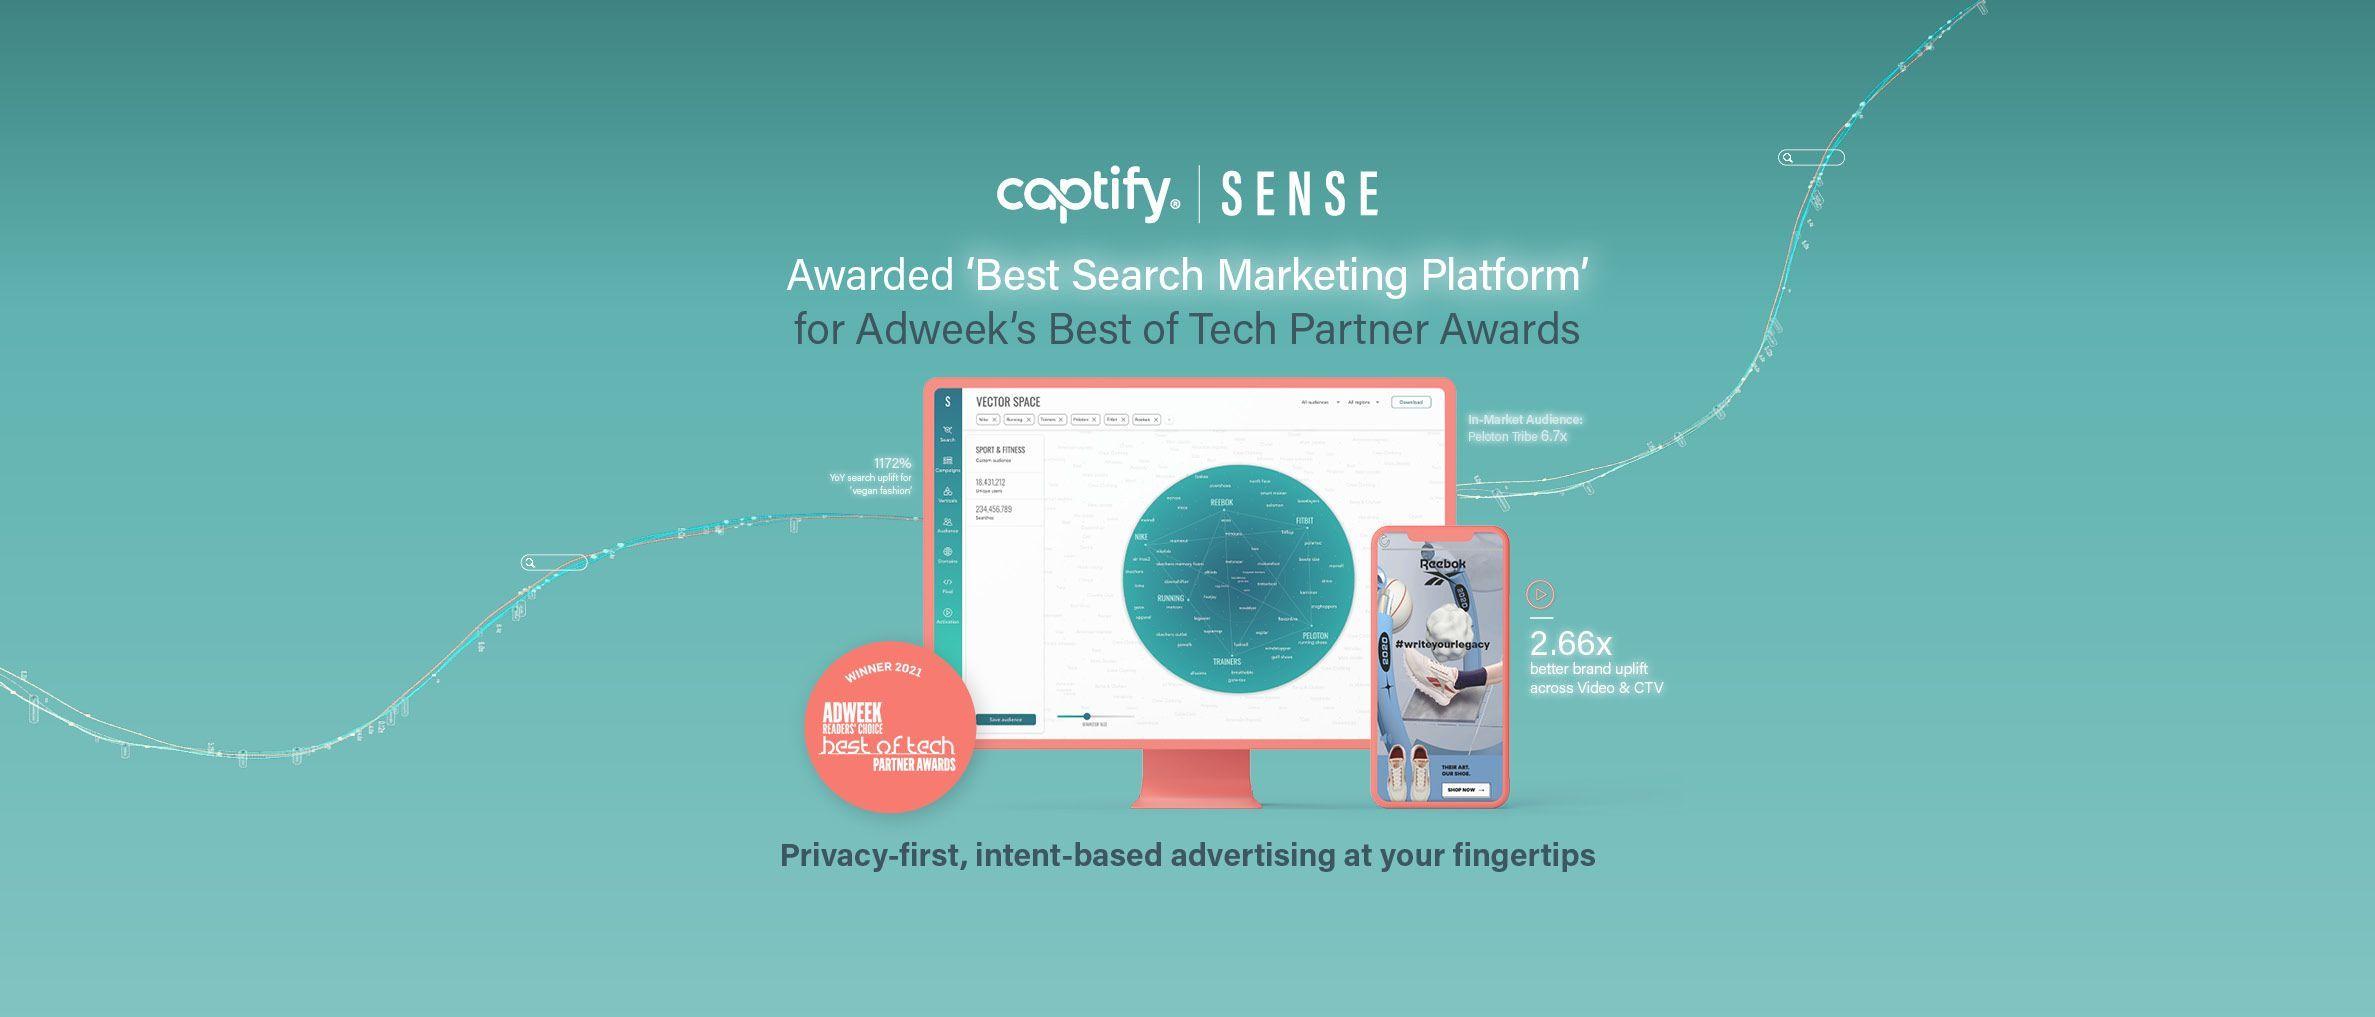 Captify's Sense Awarded 'Best Search Marketing Platform' For Adweek's Best Of Tech Partner Awards